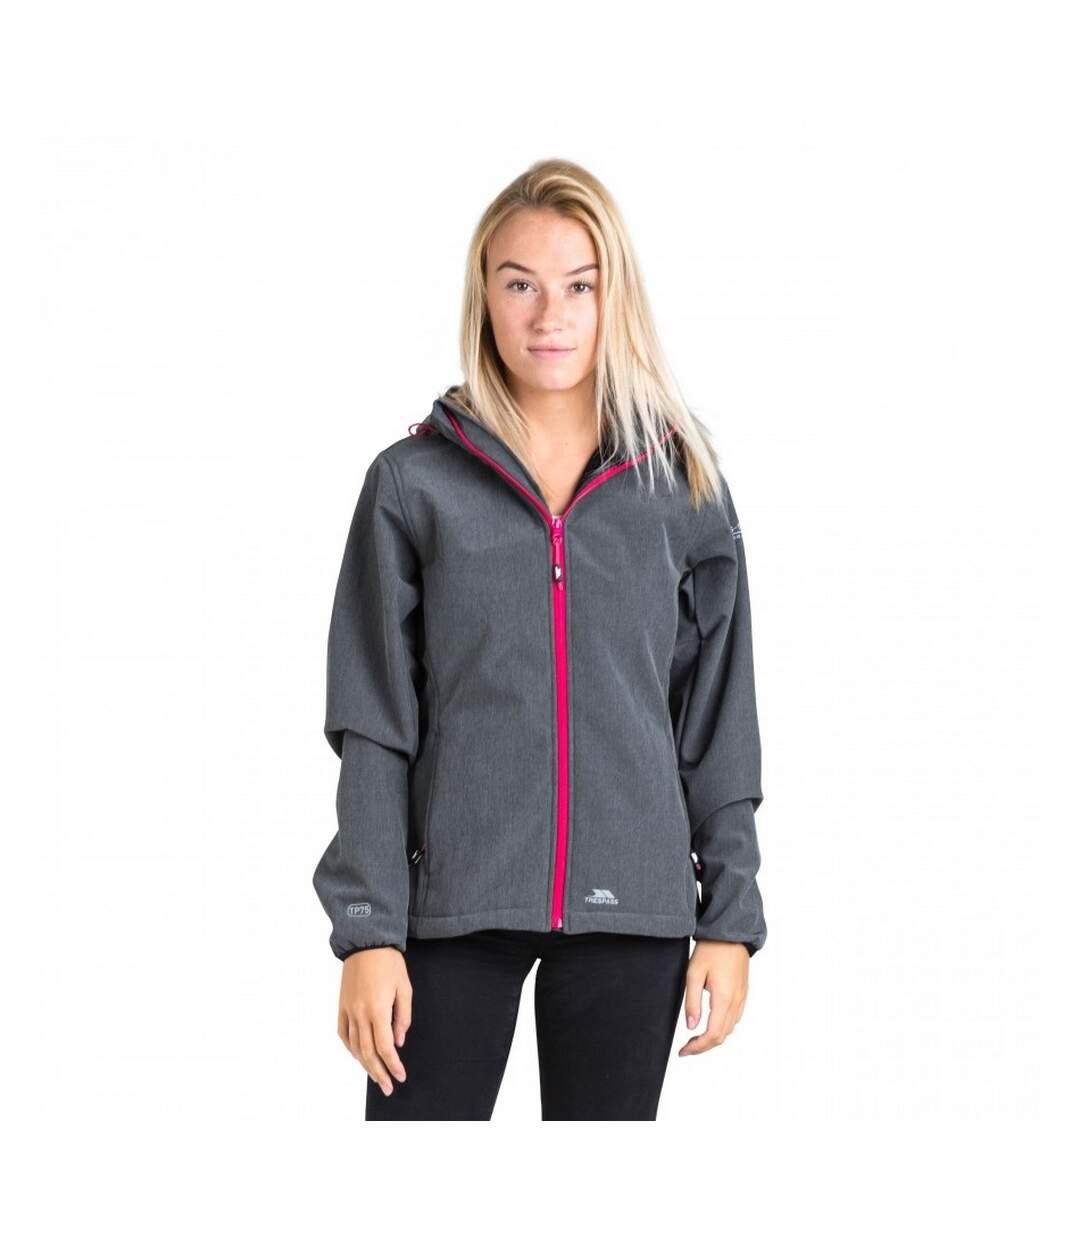 Trespass Womens/Ladies Ramona Waterproof Softshell Jacket (Carbon) - UTTP3550